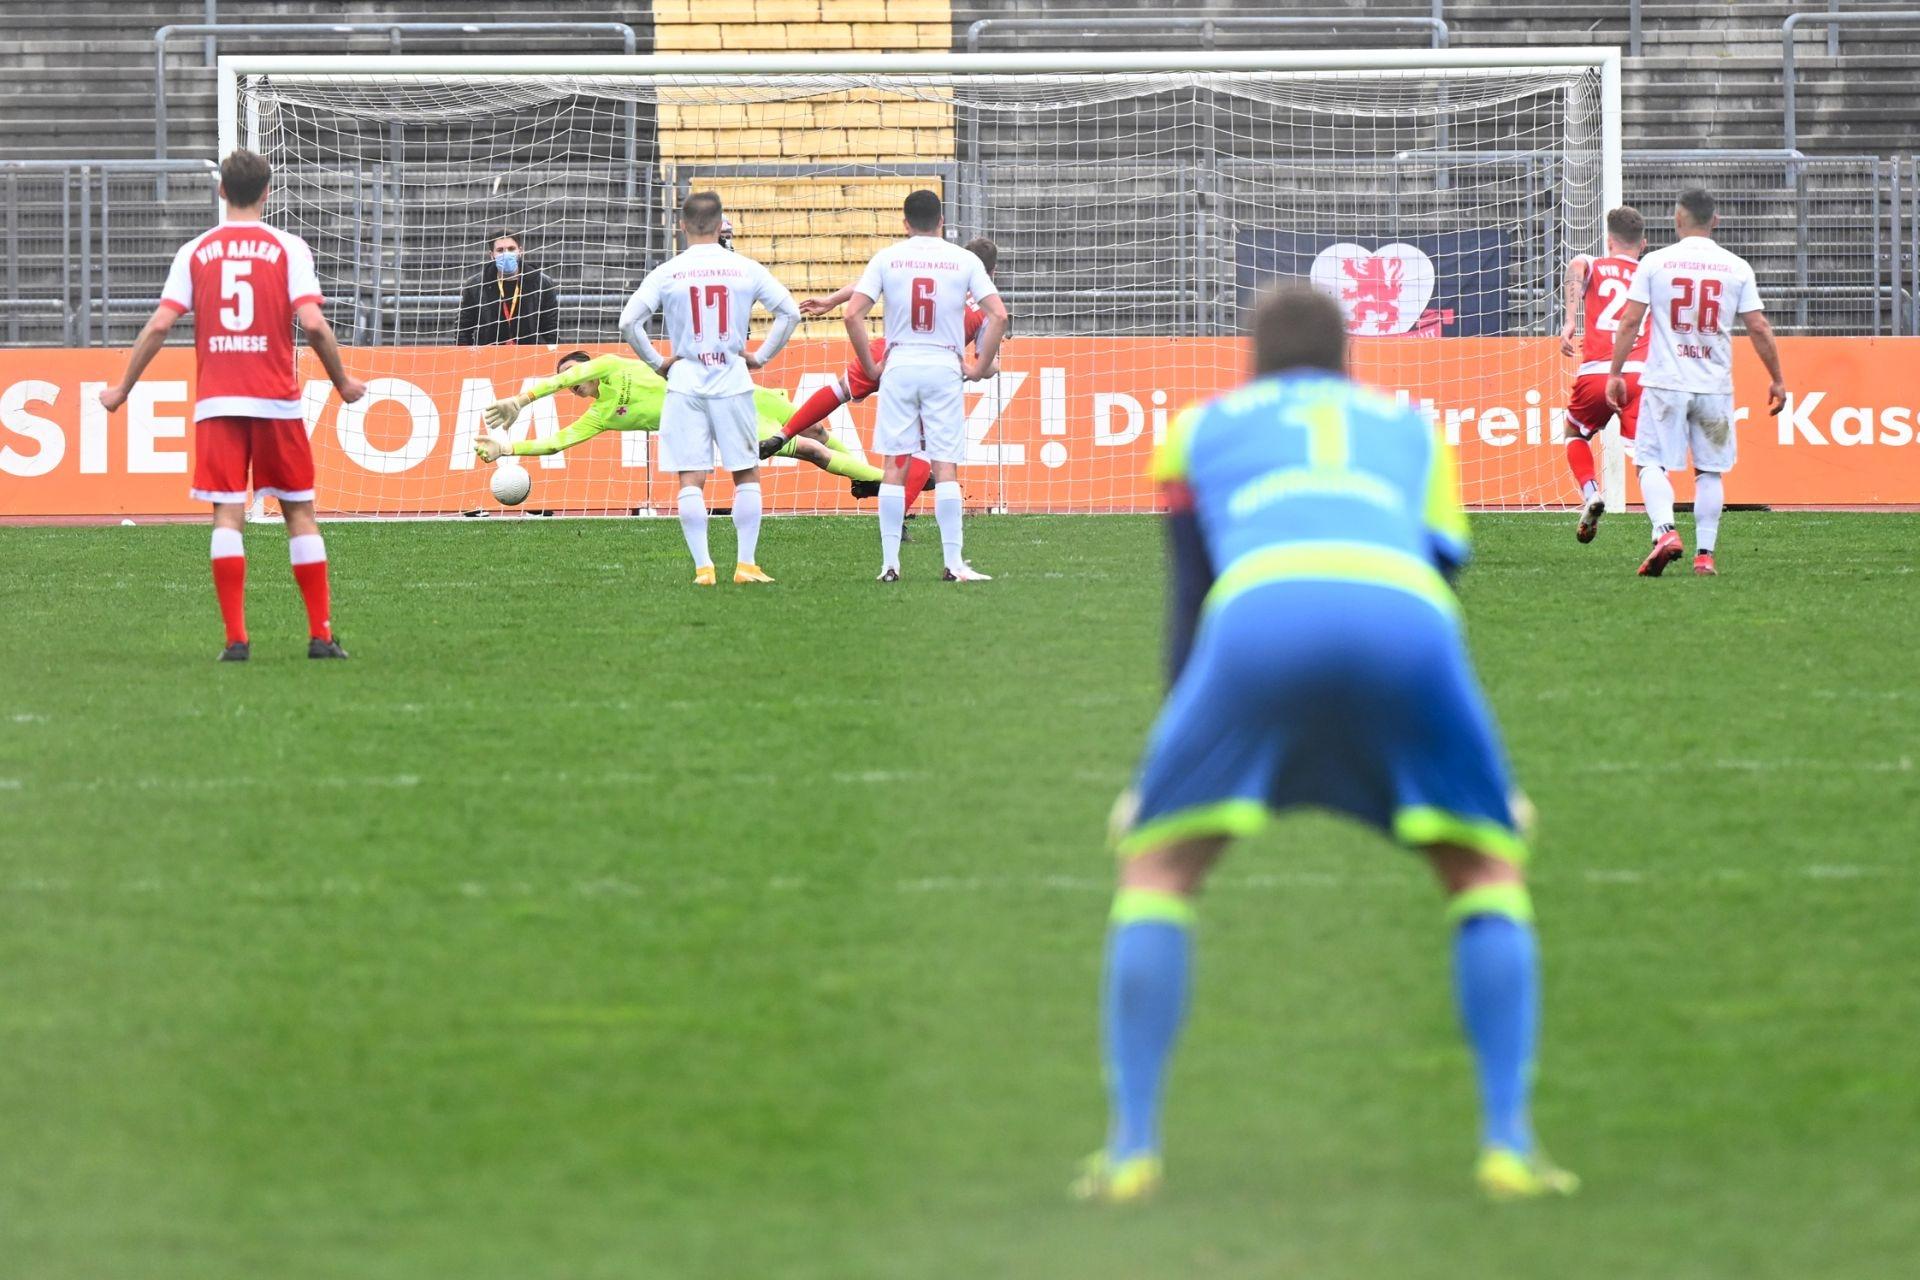 Regionalliga Südwest 2020/21, KSV Hessen Kassel, VfR Aalen, Endstand 1:1, Tor zum 1:1, Elfmeter